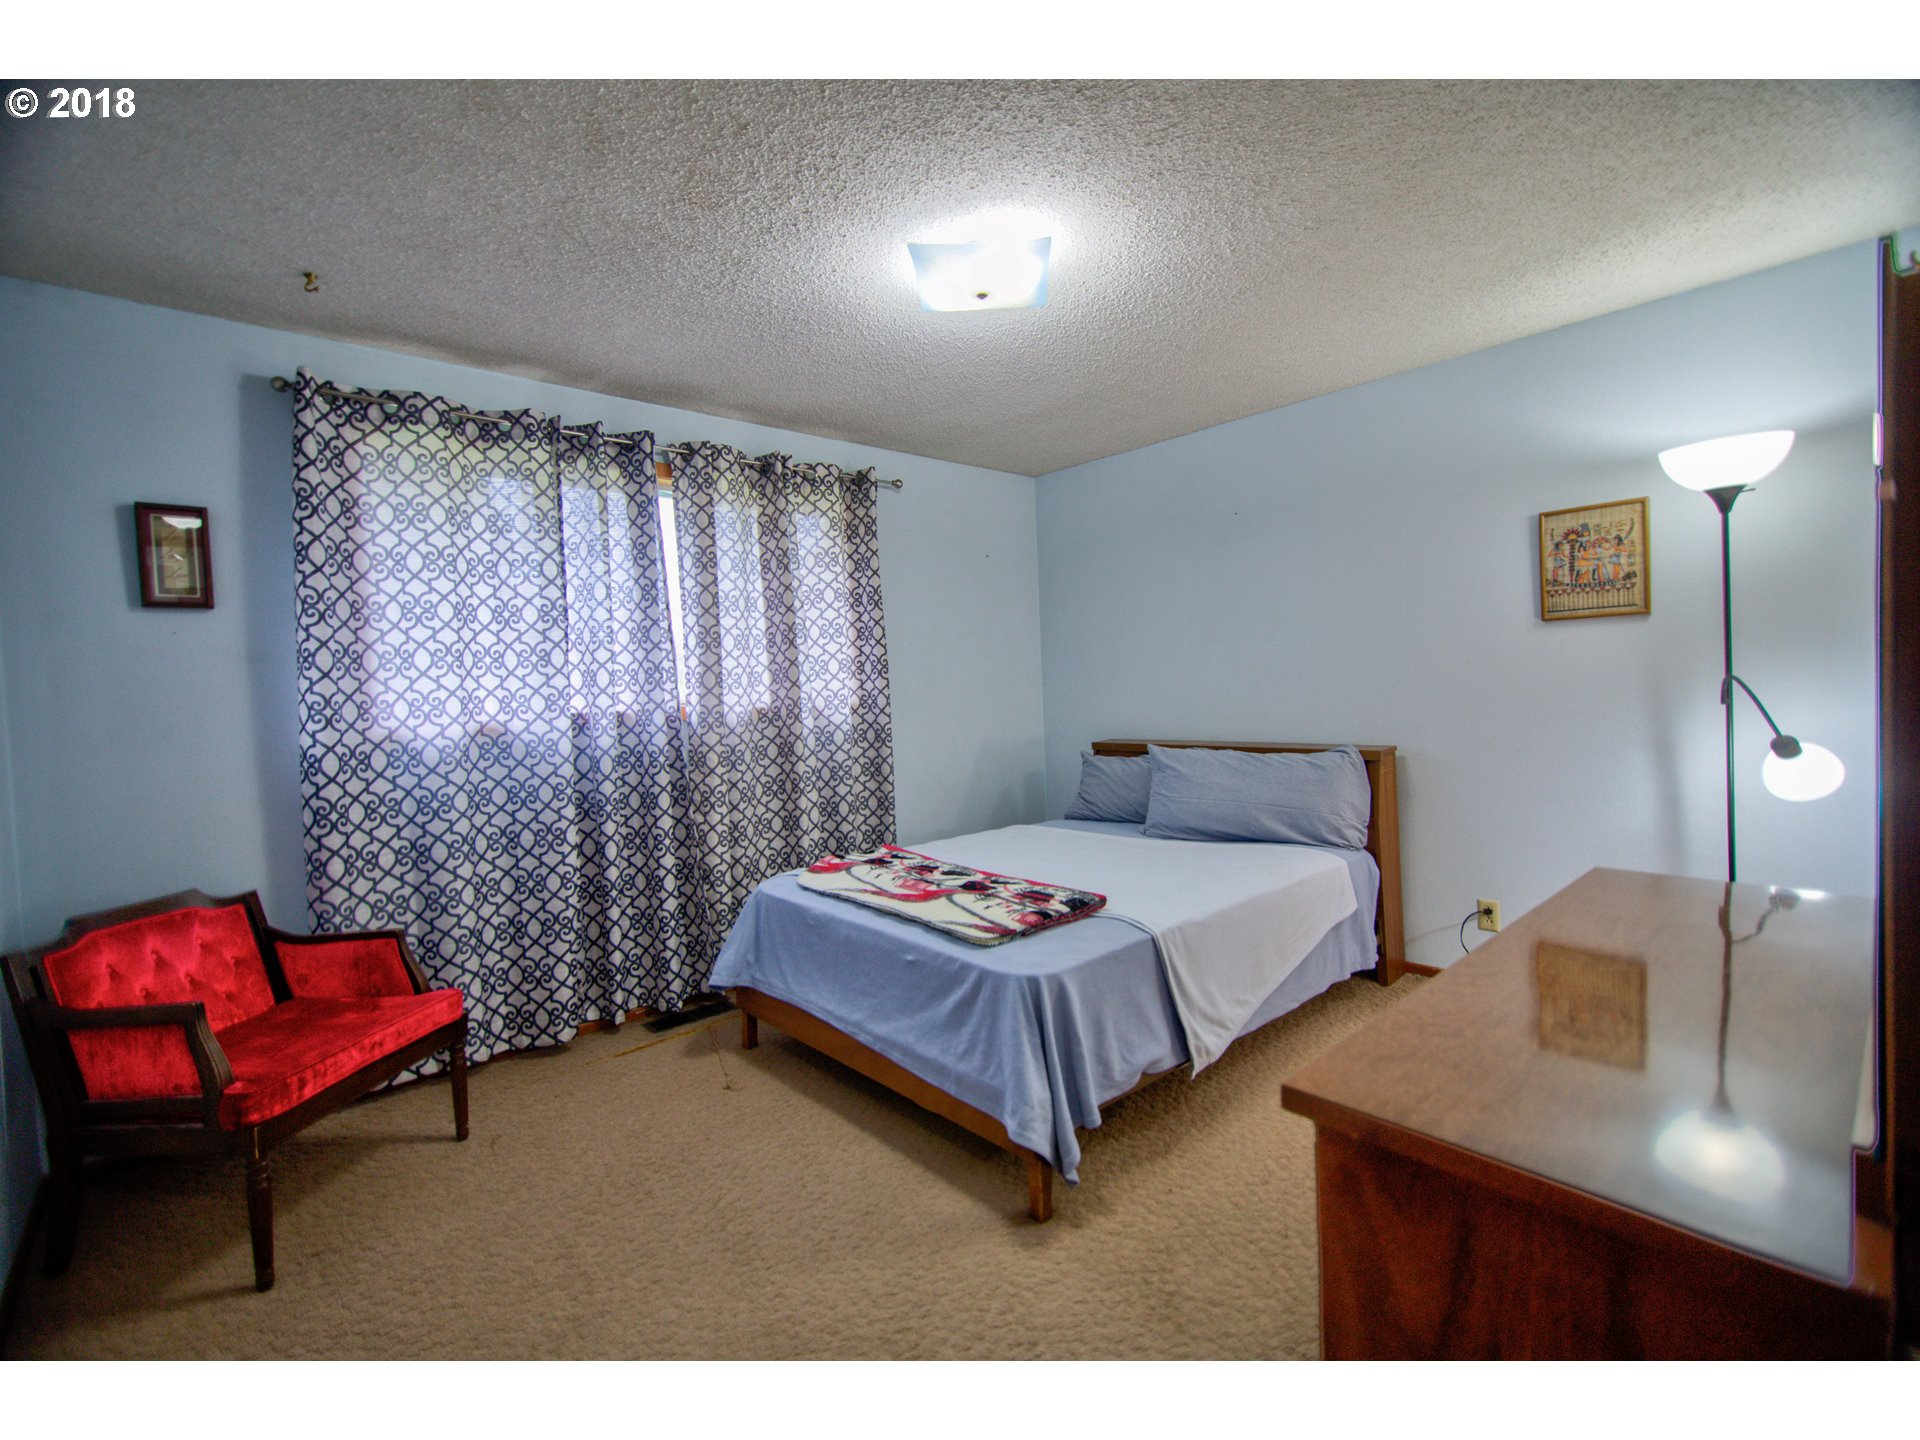 649 36TH AVE Salem, OR 97301 - MLS #: 18158929